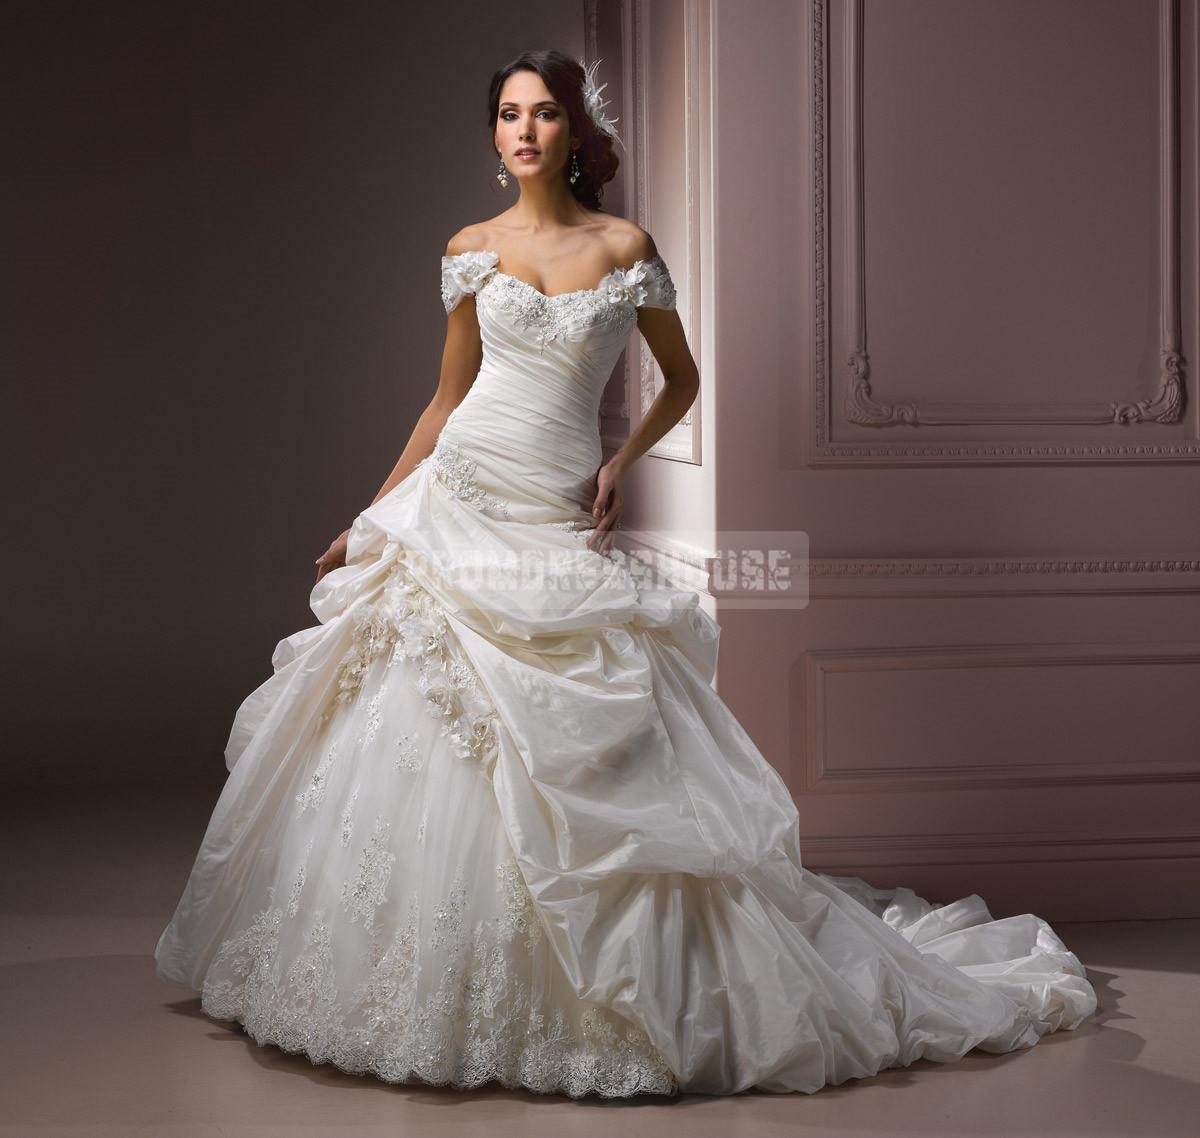 Sweetheart ball gown classic dropped waist flowers wedding dress